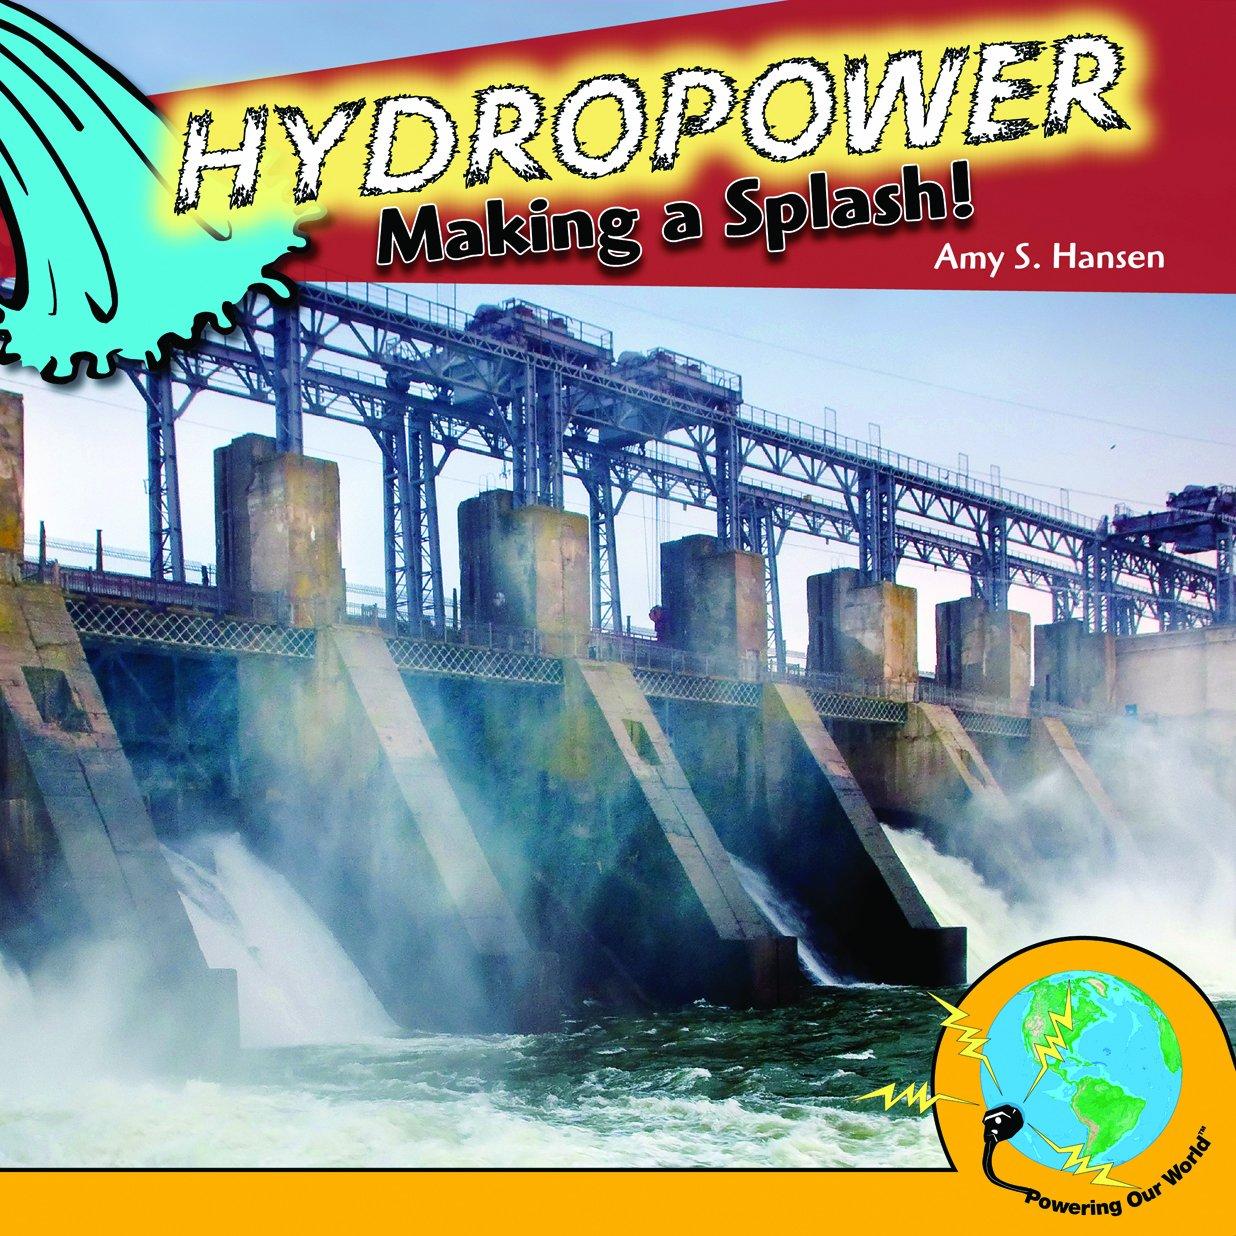 Download Hydropower: Making a Splash! (Powering Our World) PDF